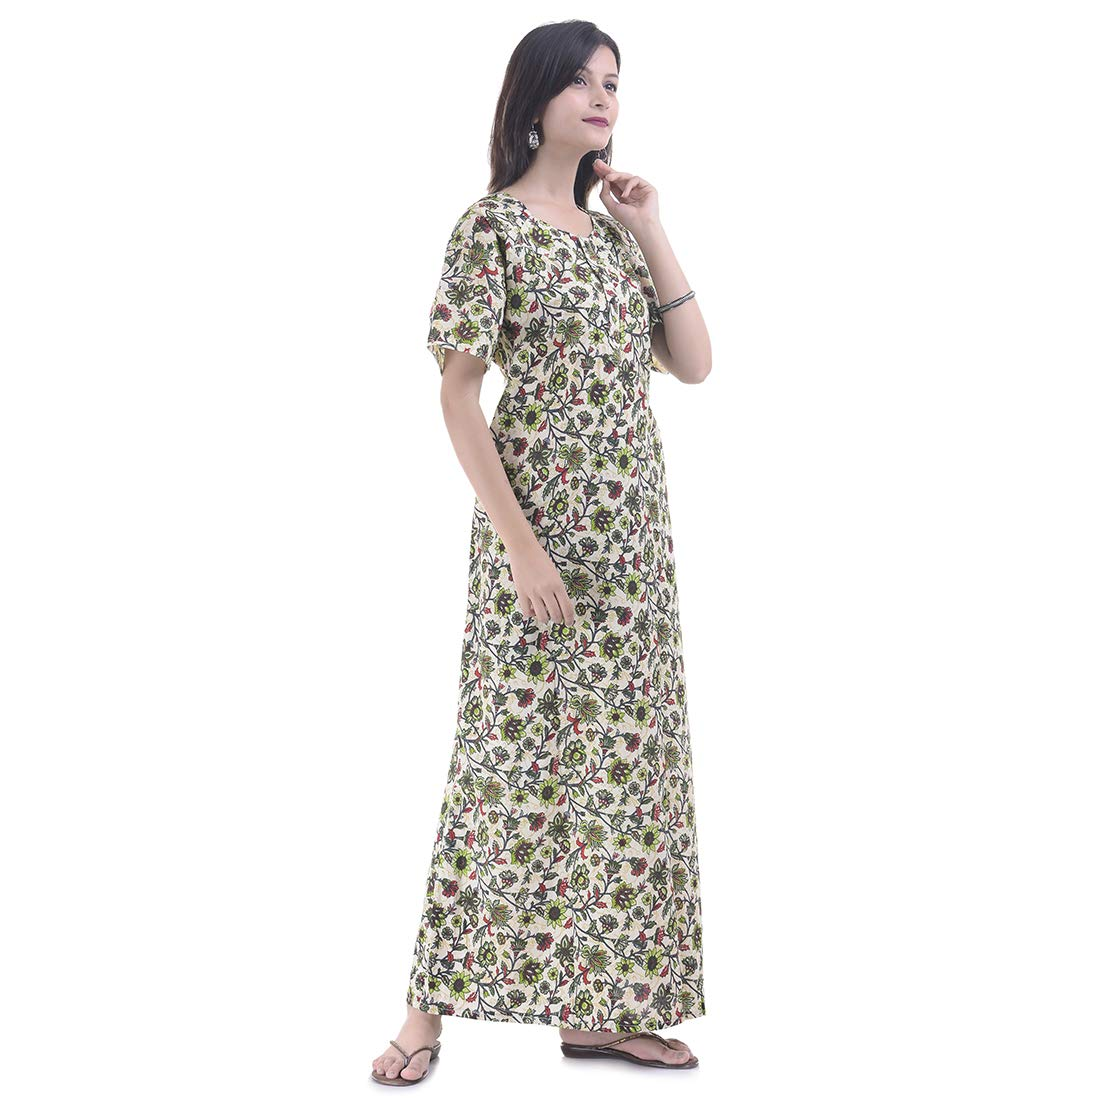 5c386557f4 Women cotton night wear gown sexy nighties nighty sleepwear indian dress  long skirt maxi bath robe